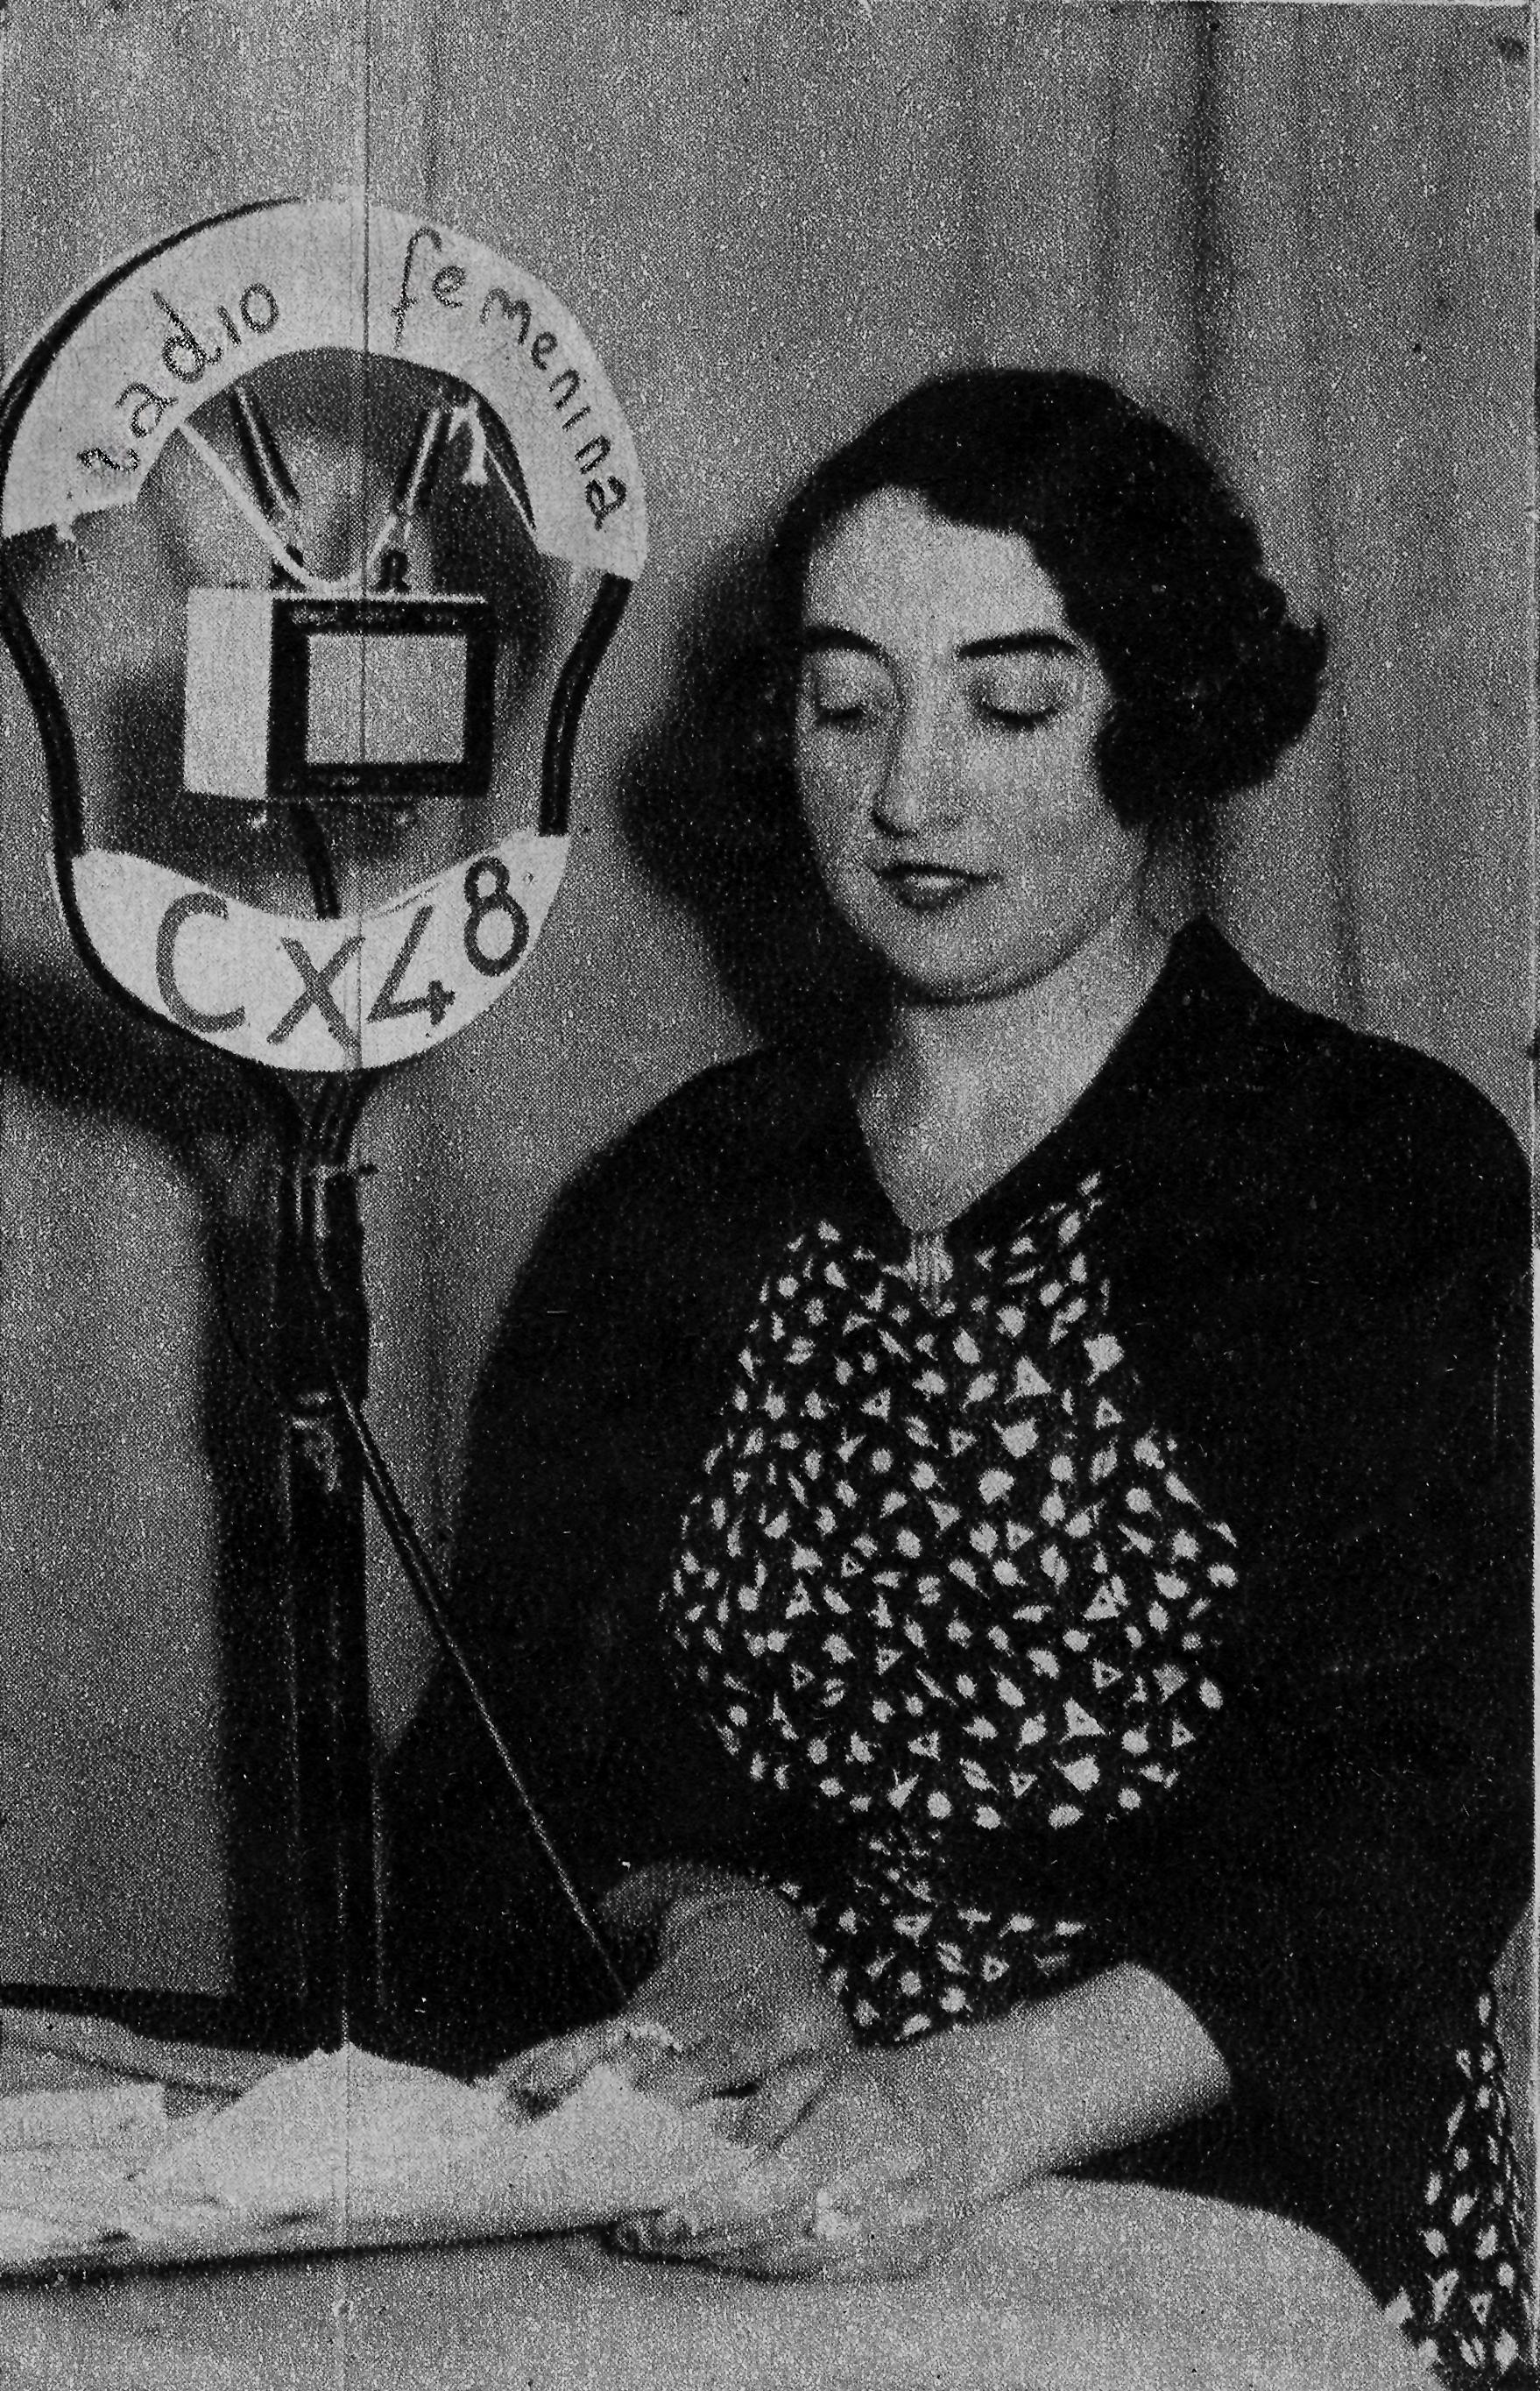 CX48 Radio Feminina